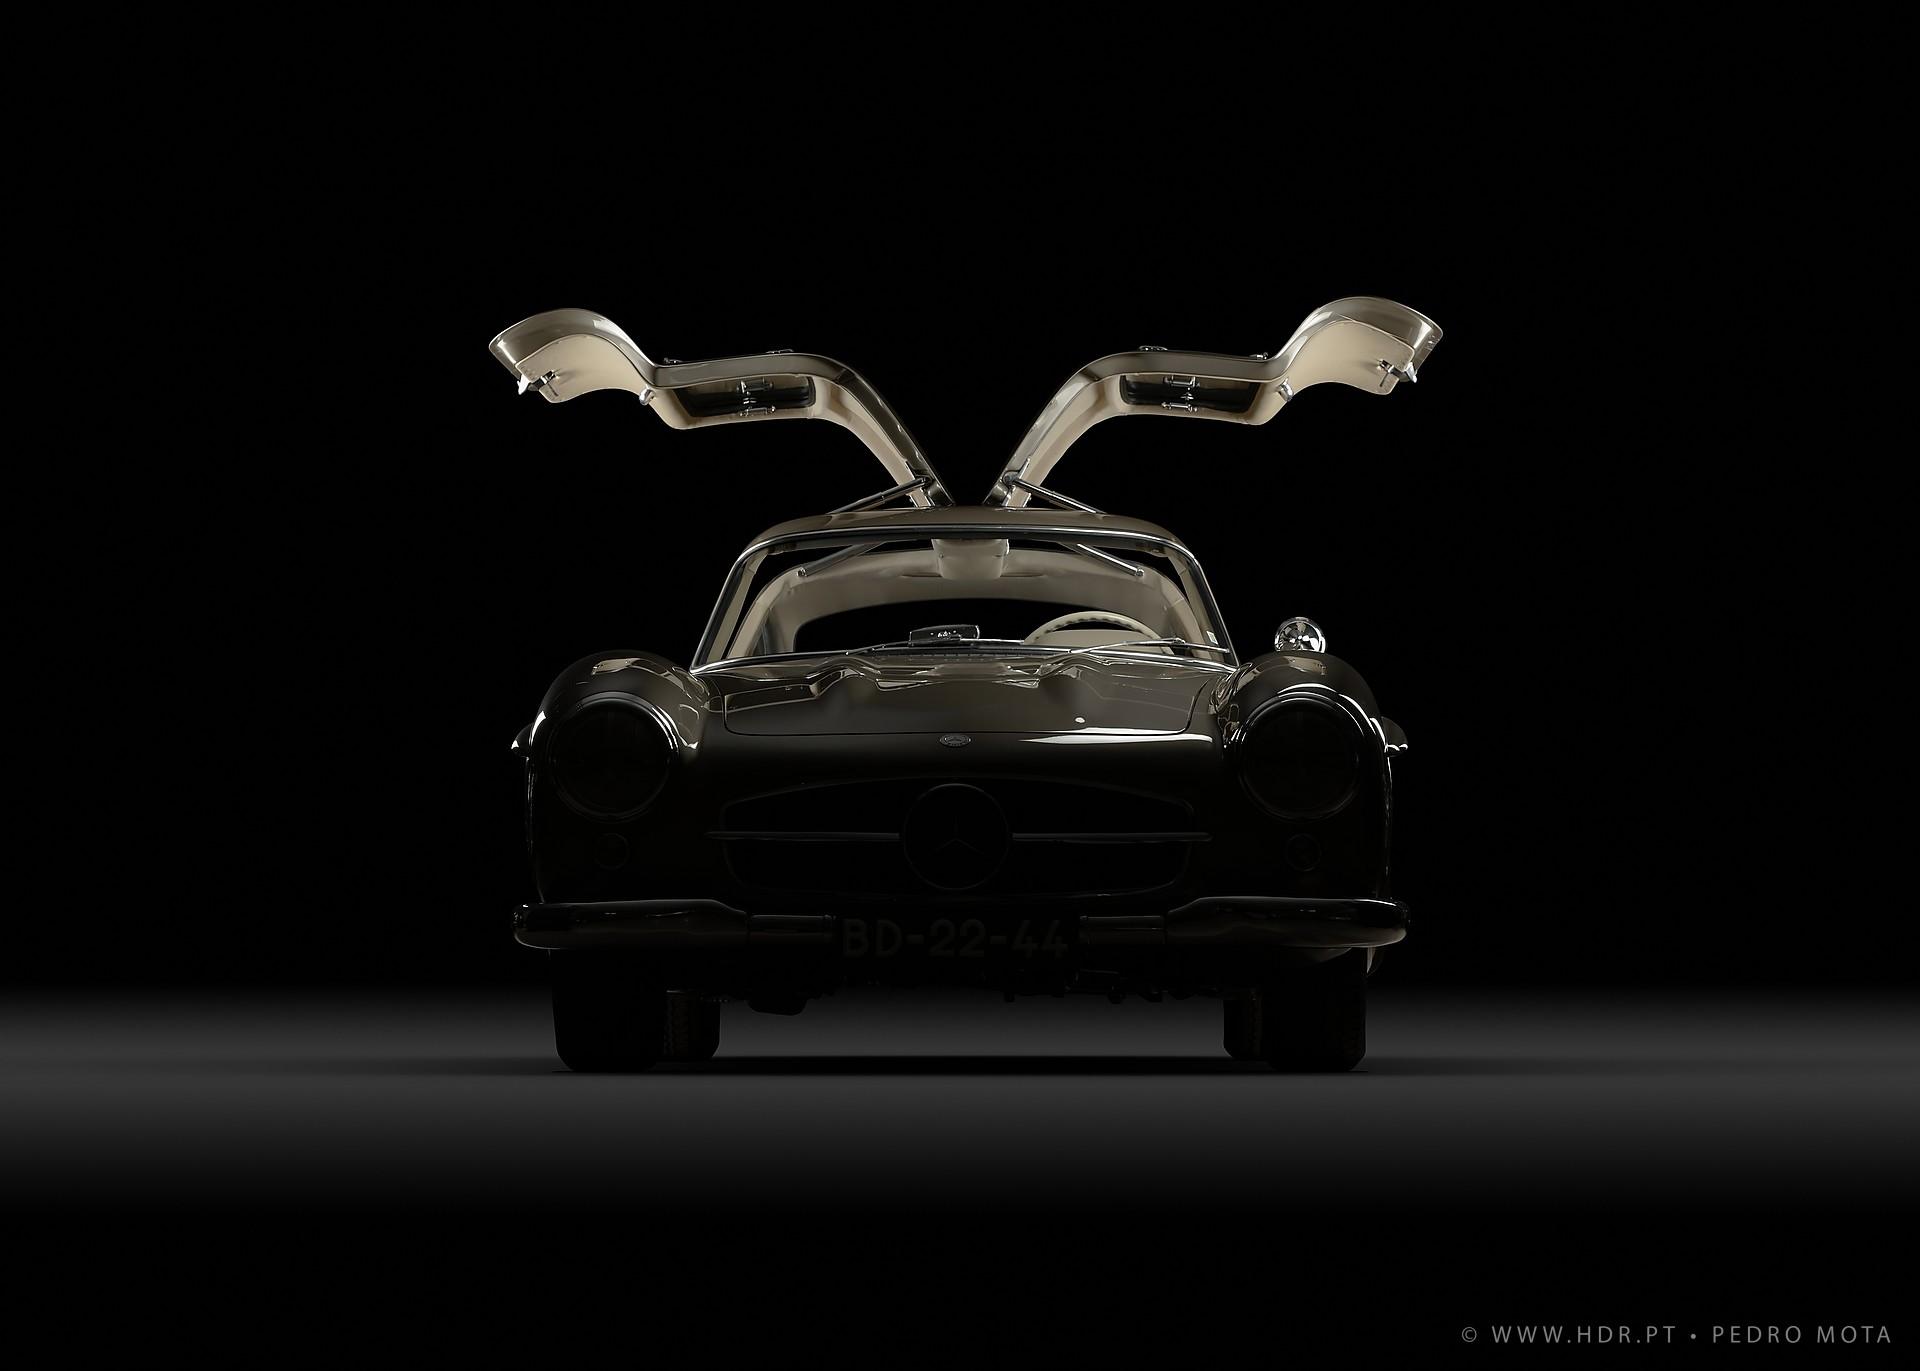 Mercedes 300 SL 001